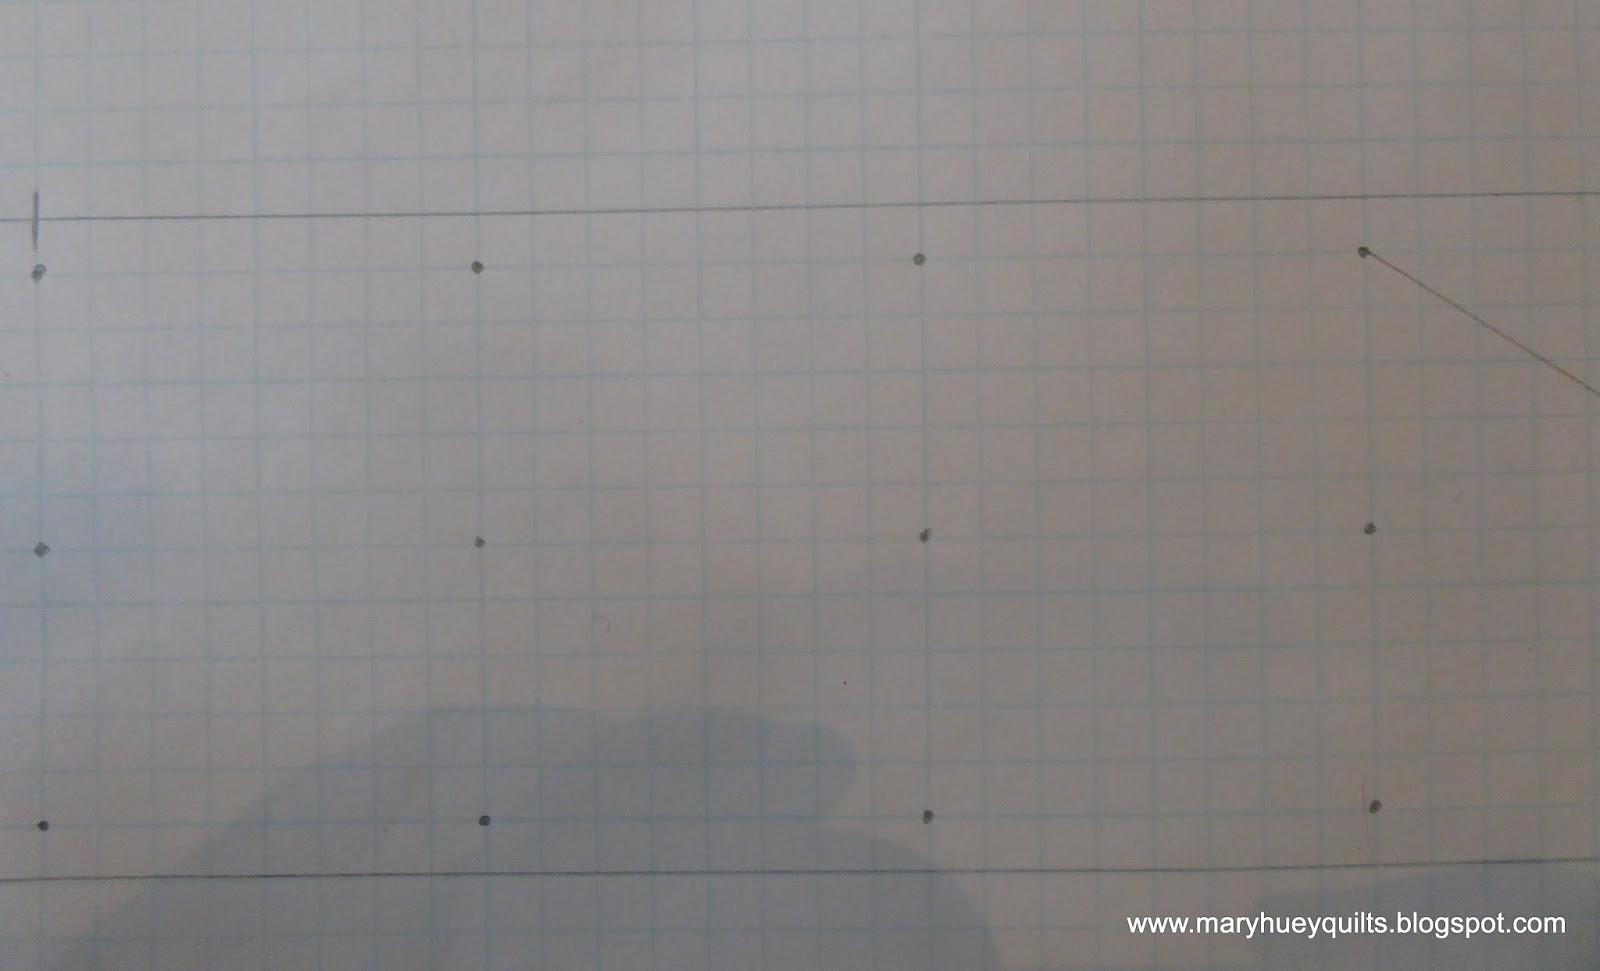 5 Segments Line And 12 Dots